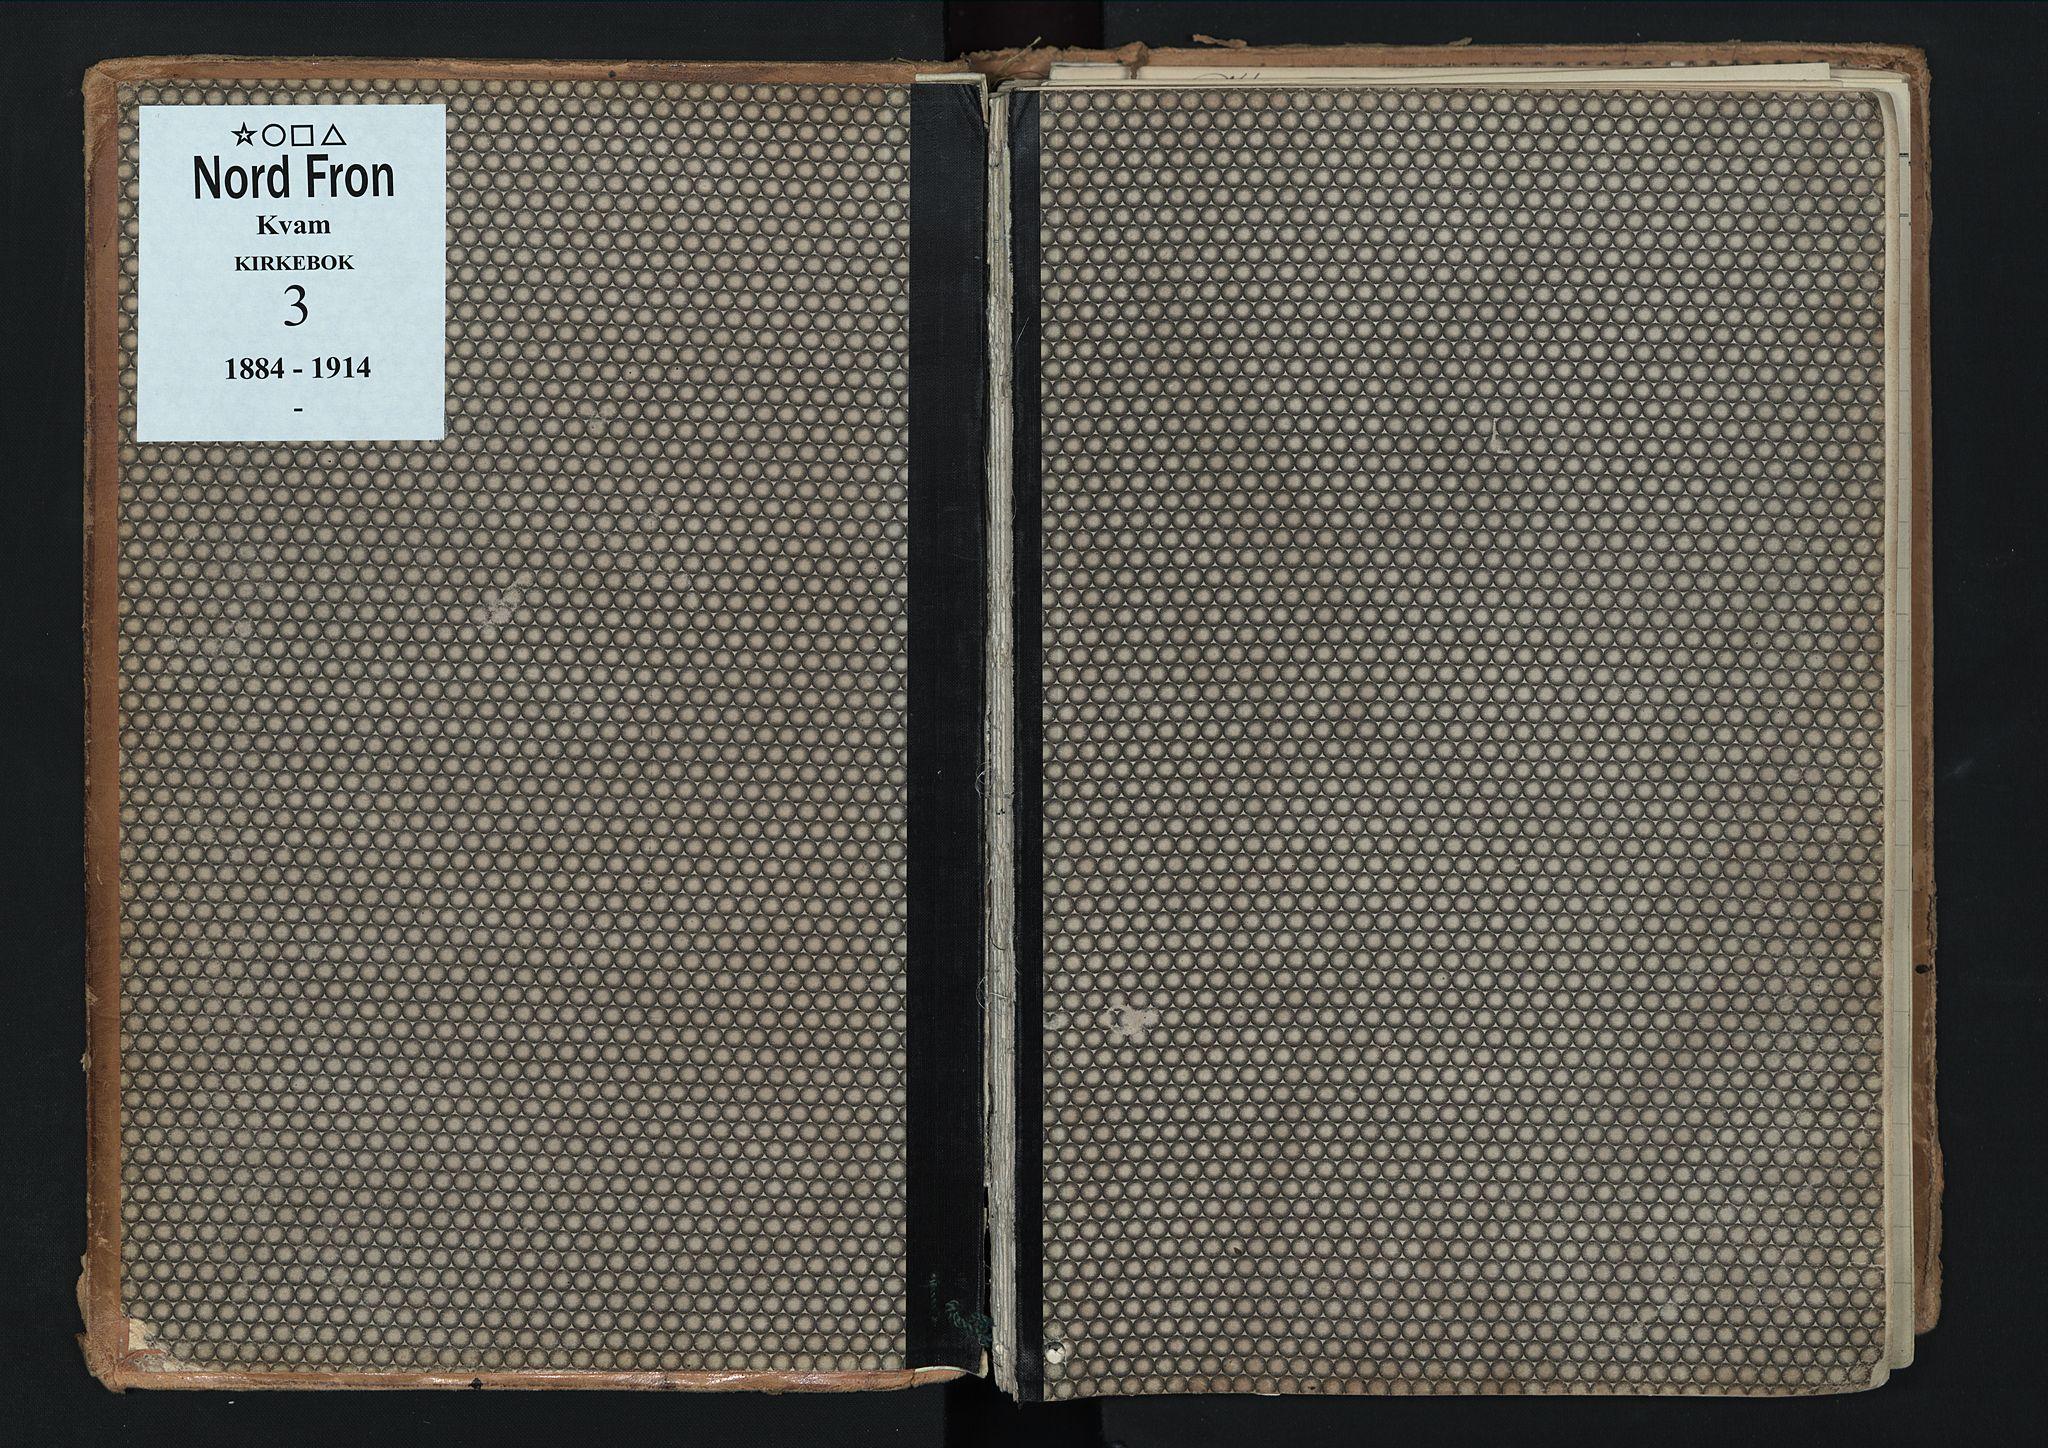 SAH, Nord-Fron prestekontor, Ministerialbok nr. 3, 1884-1914